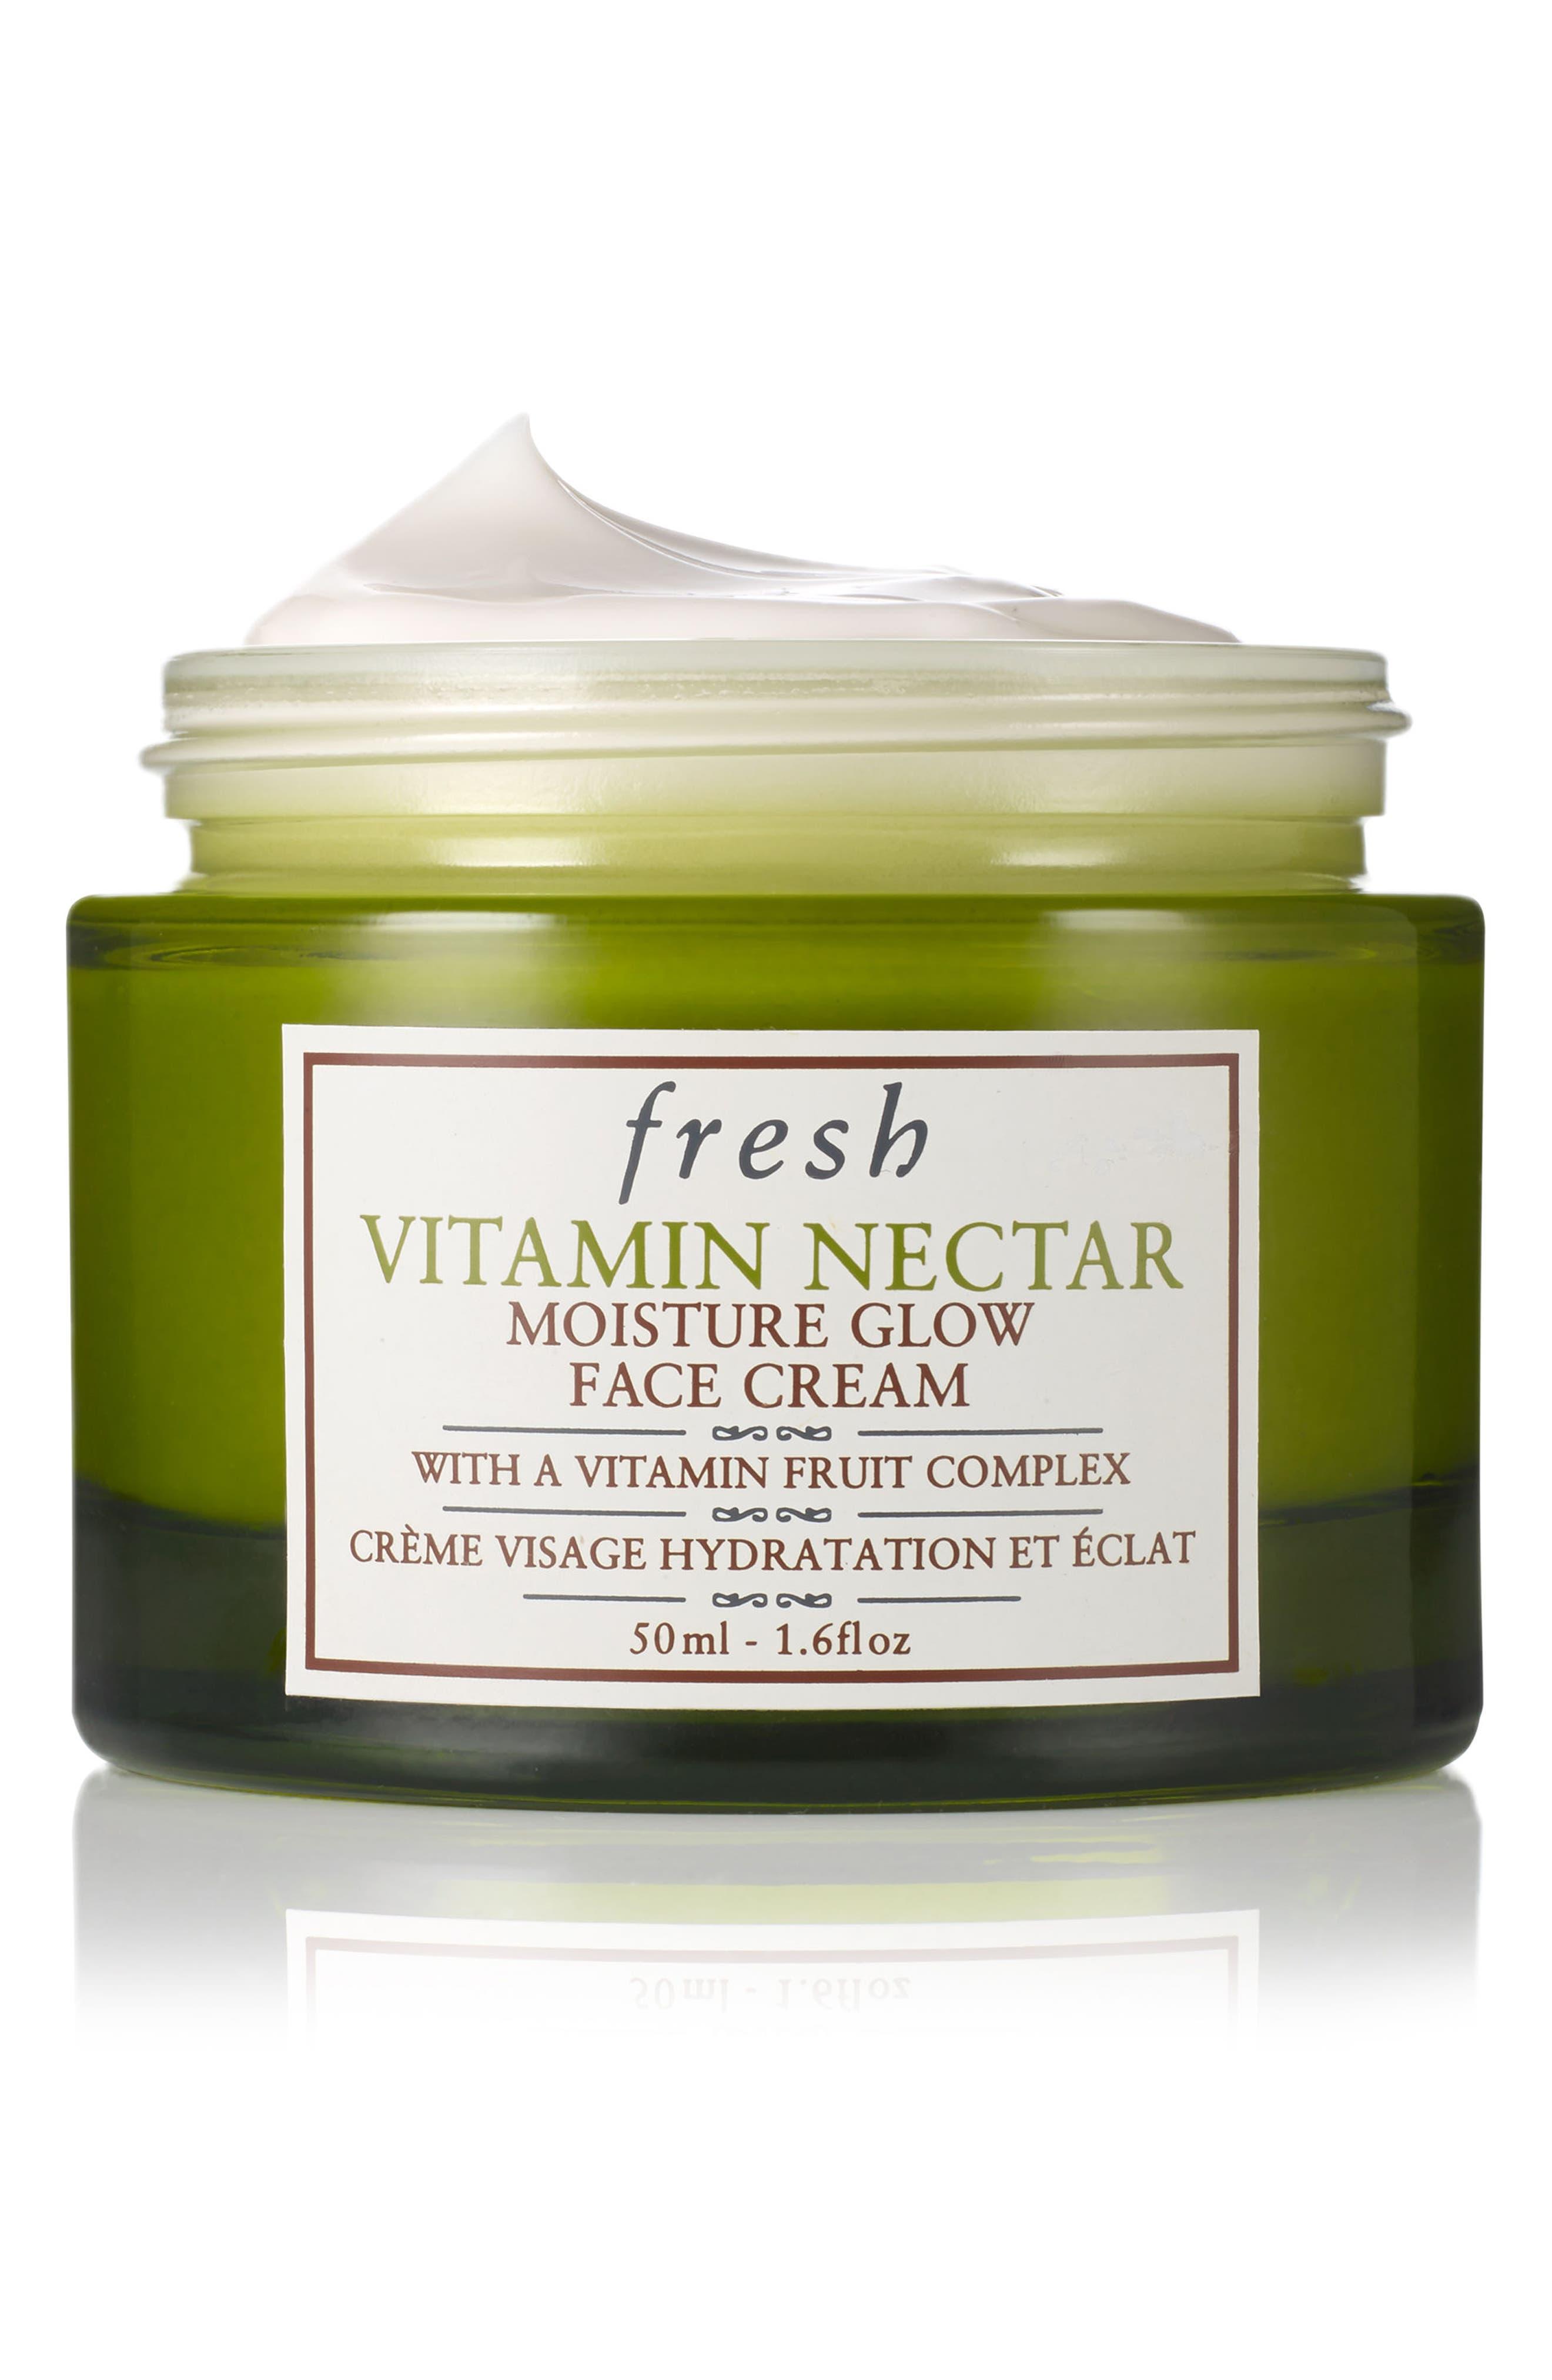 Fresh® Vitamin Nectar Moisture Glow Face Cream